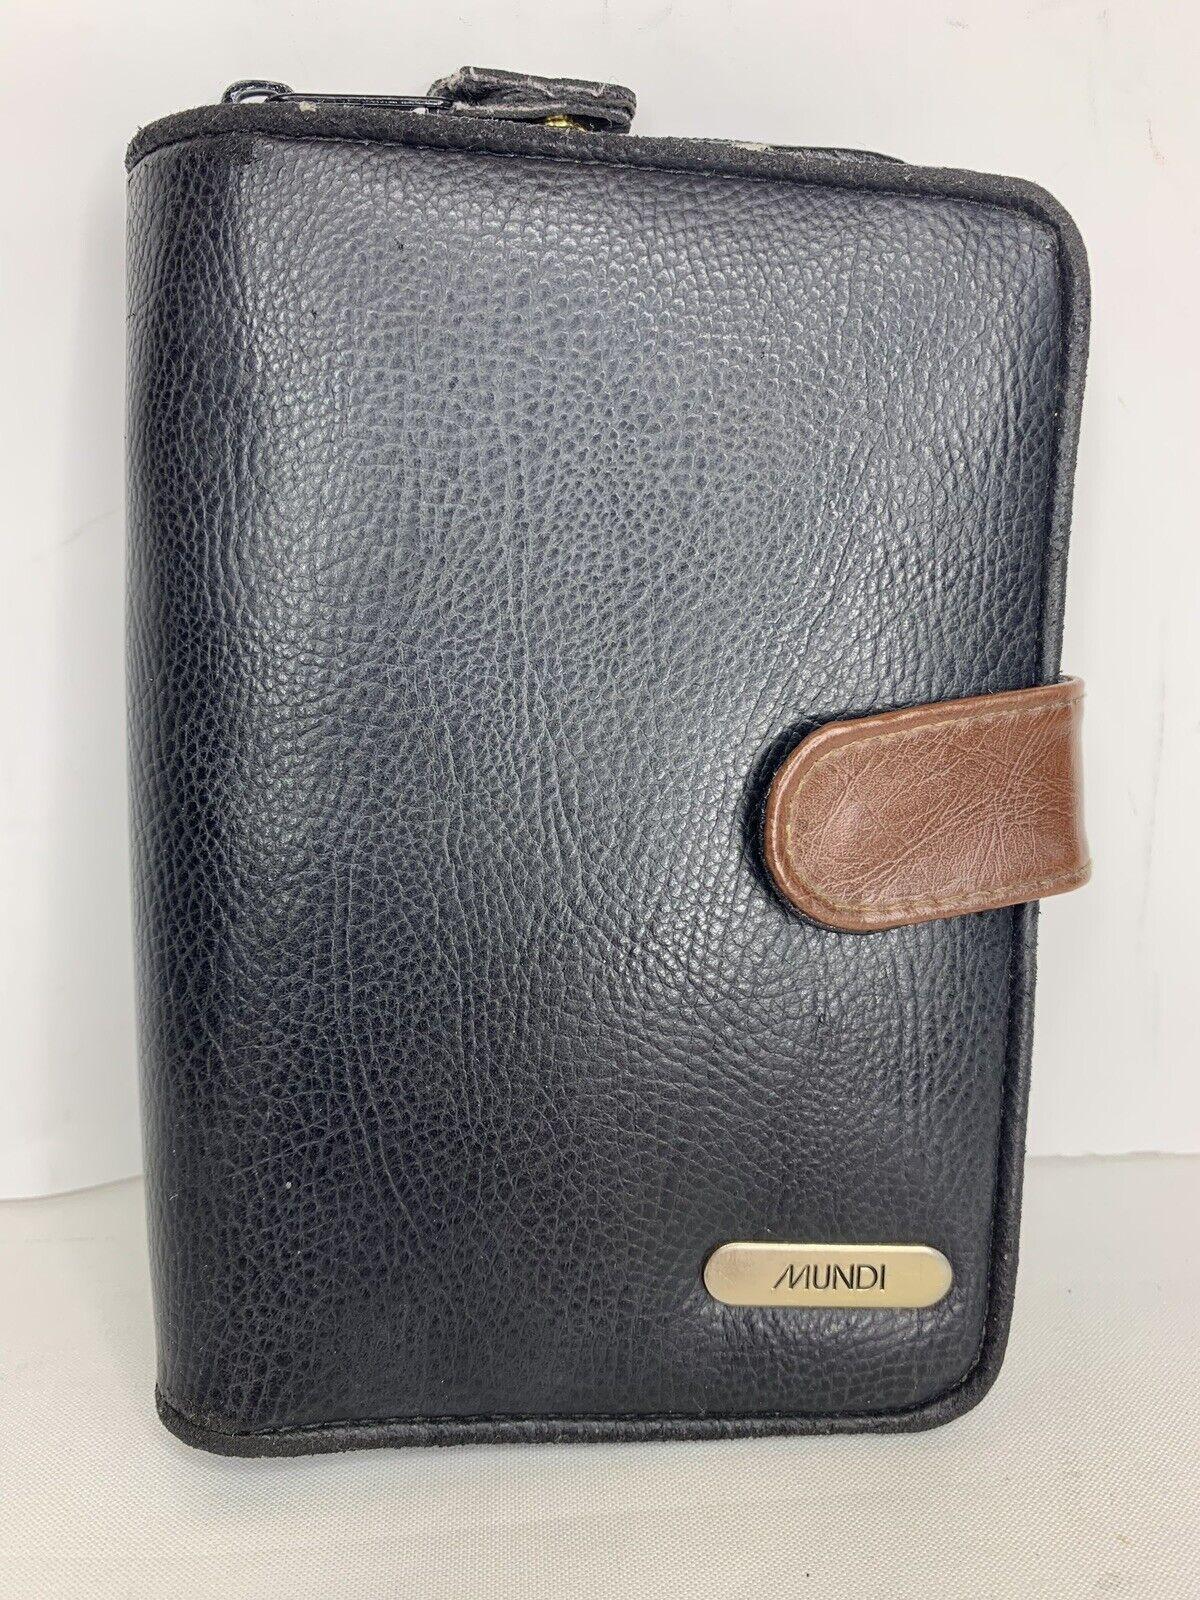 Mundi Black Leather Wallet Organizer Clutch Holds Everything Cards ID Change